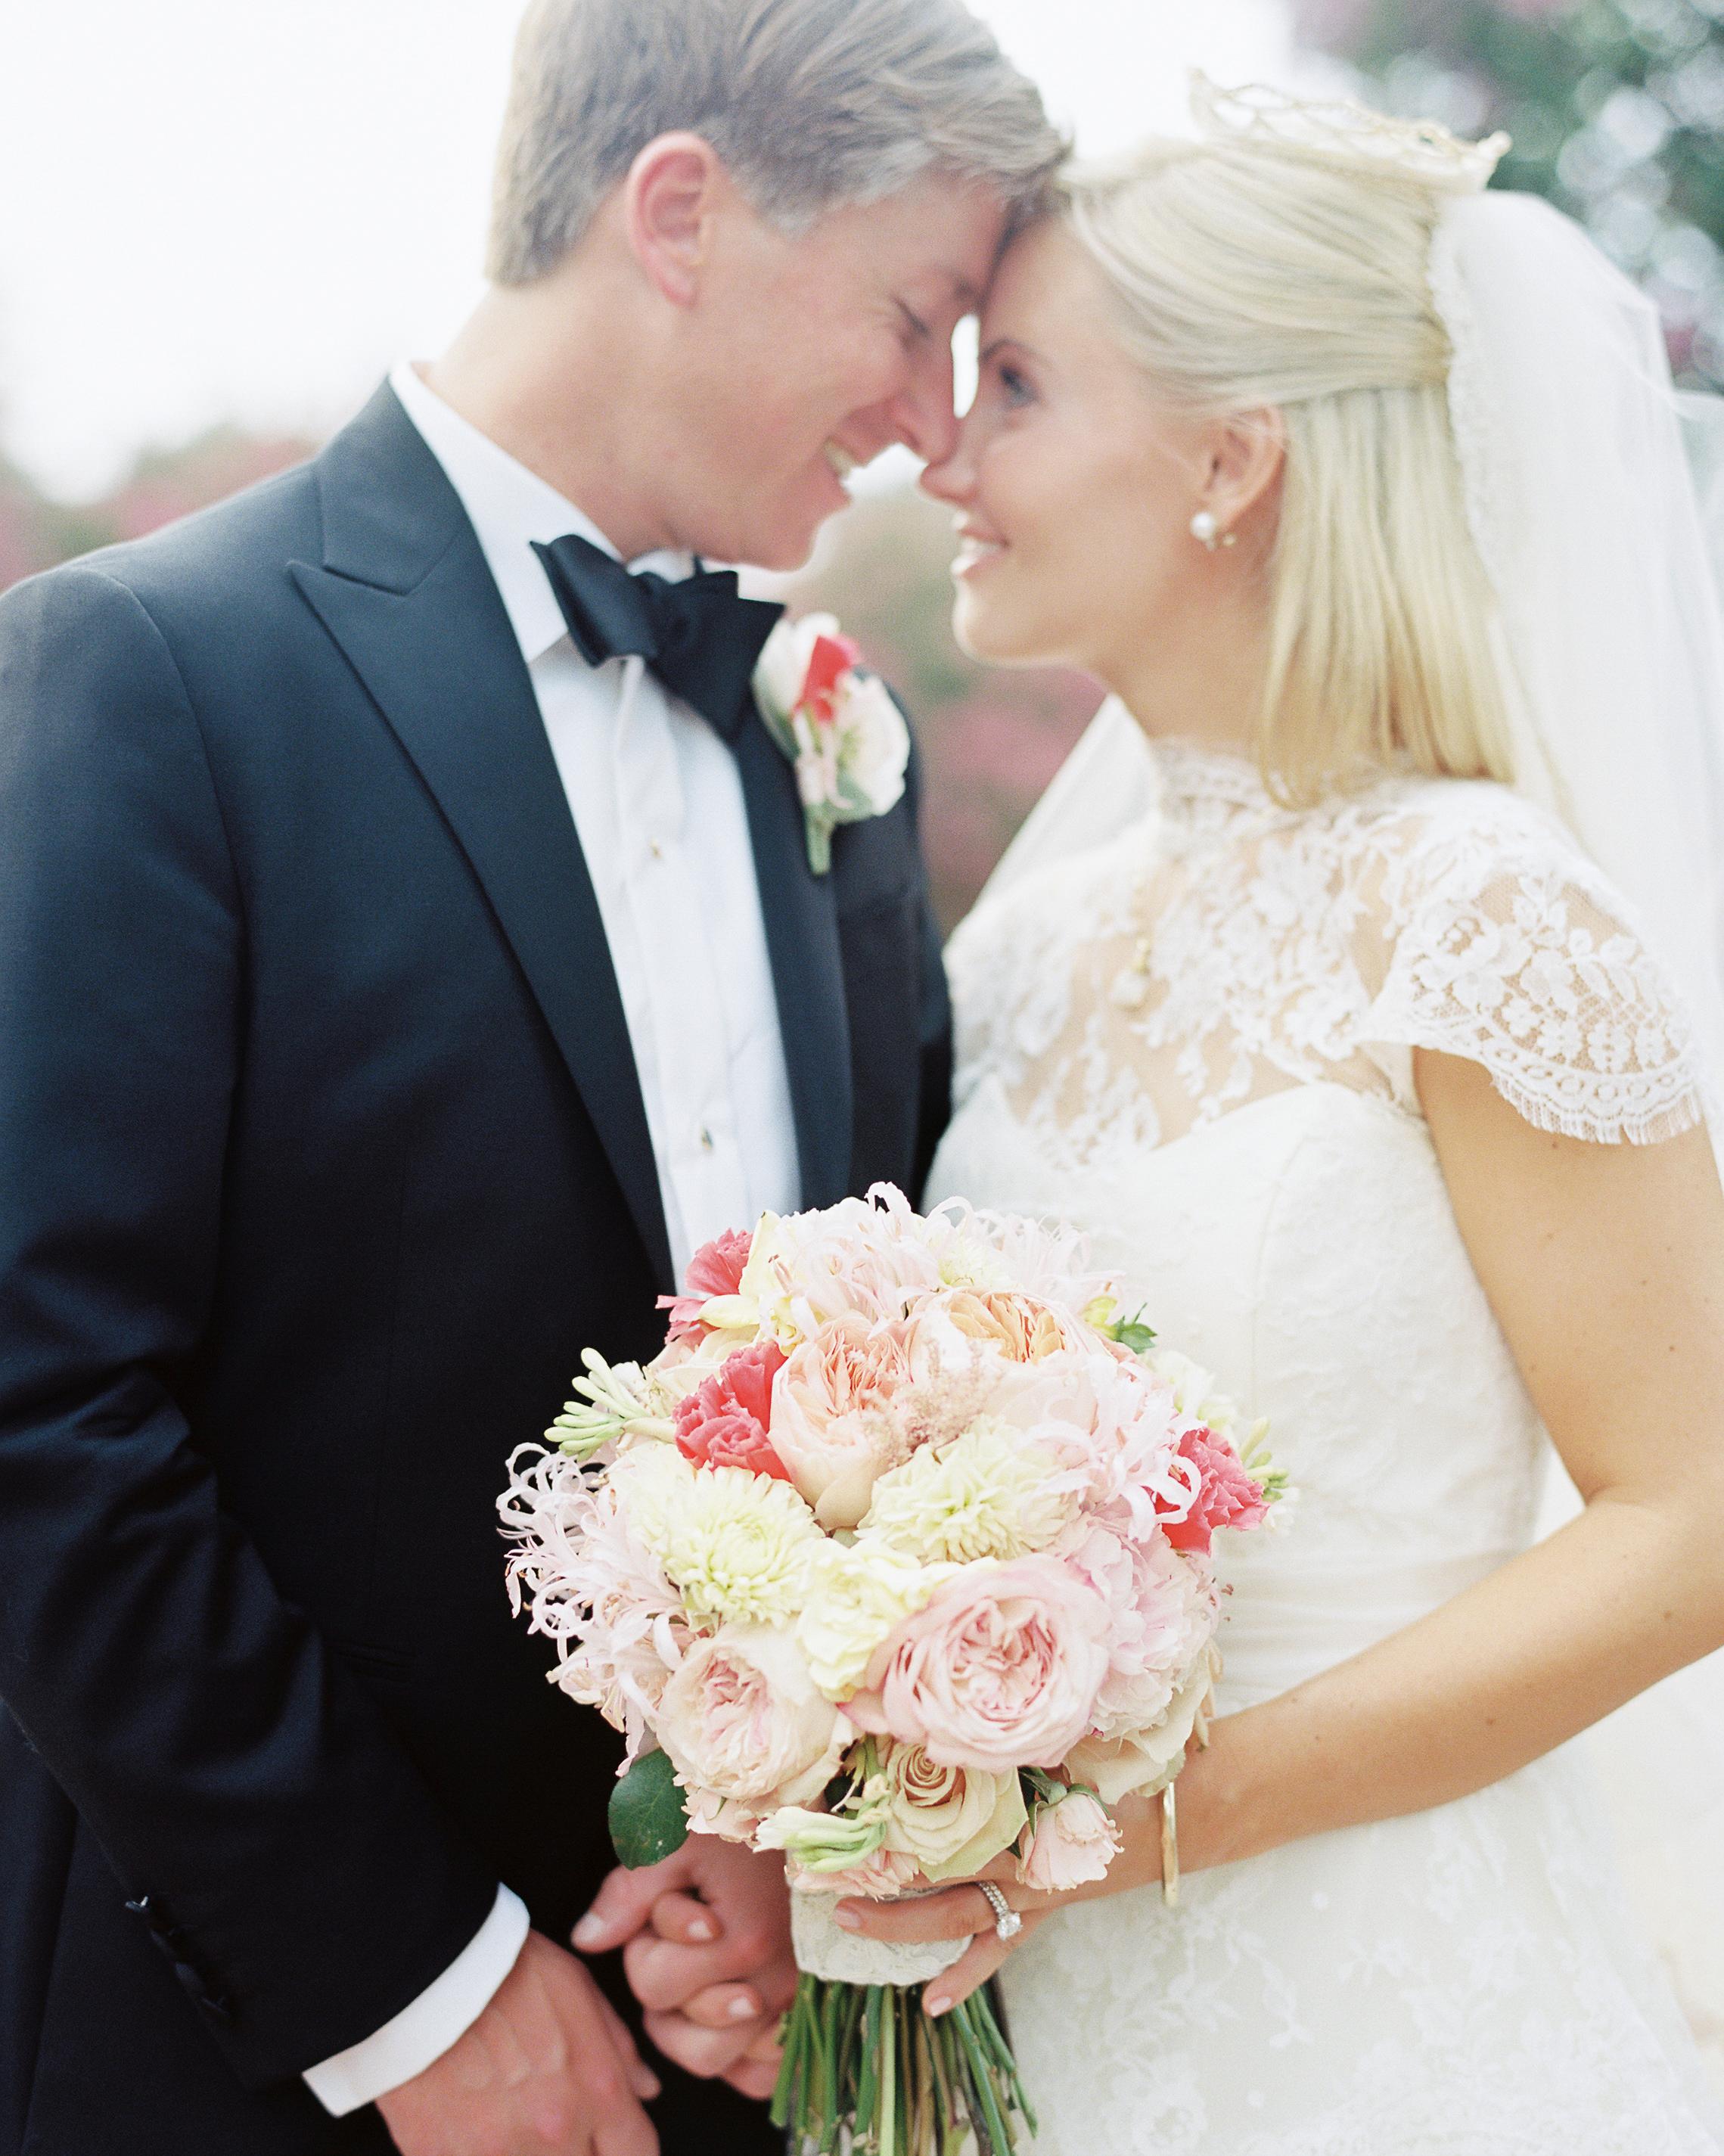 molly-patrick-wedding-couple-3298-s111760-0115.jpg